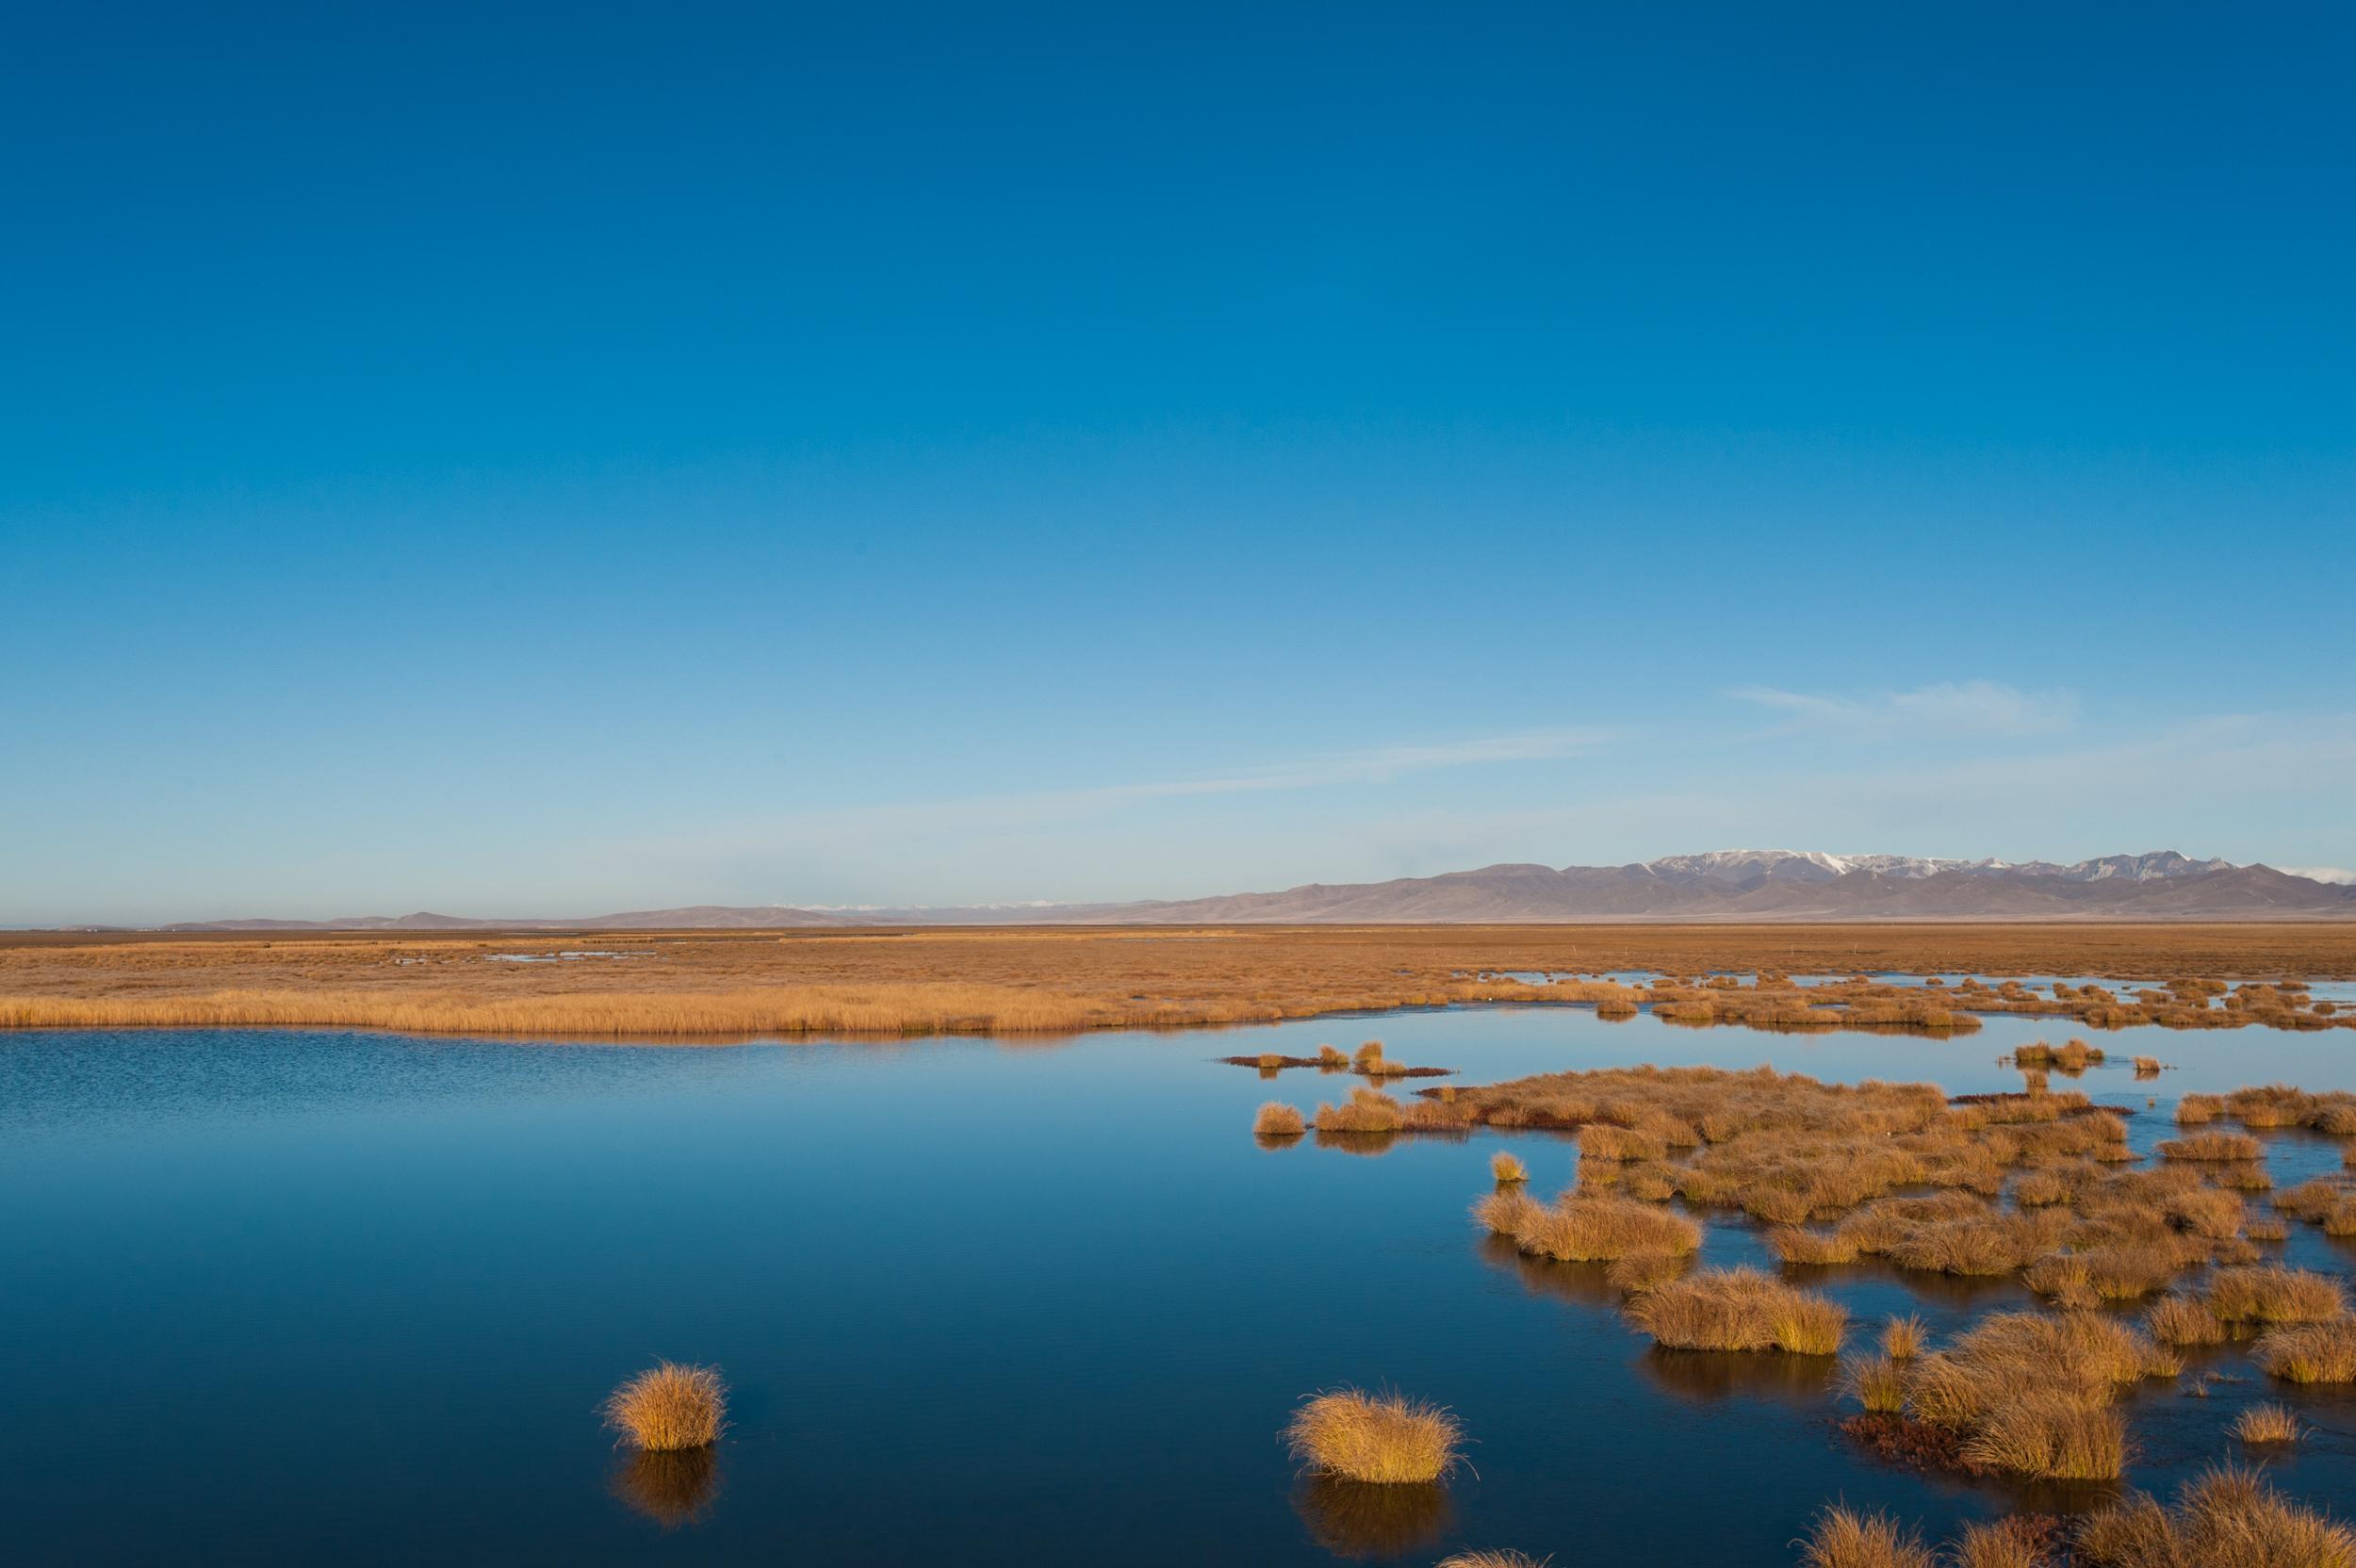 Wetlands _DSC8706.jpg